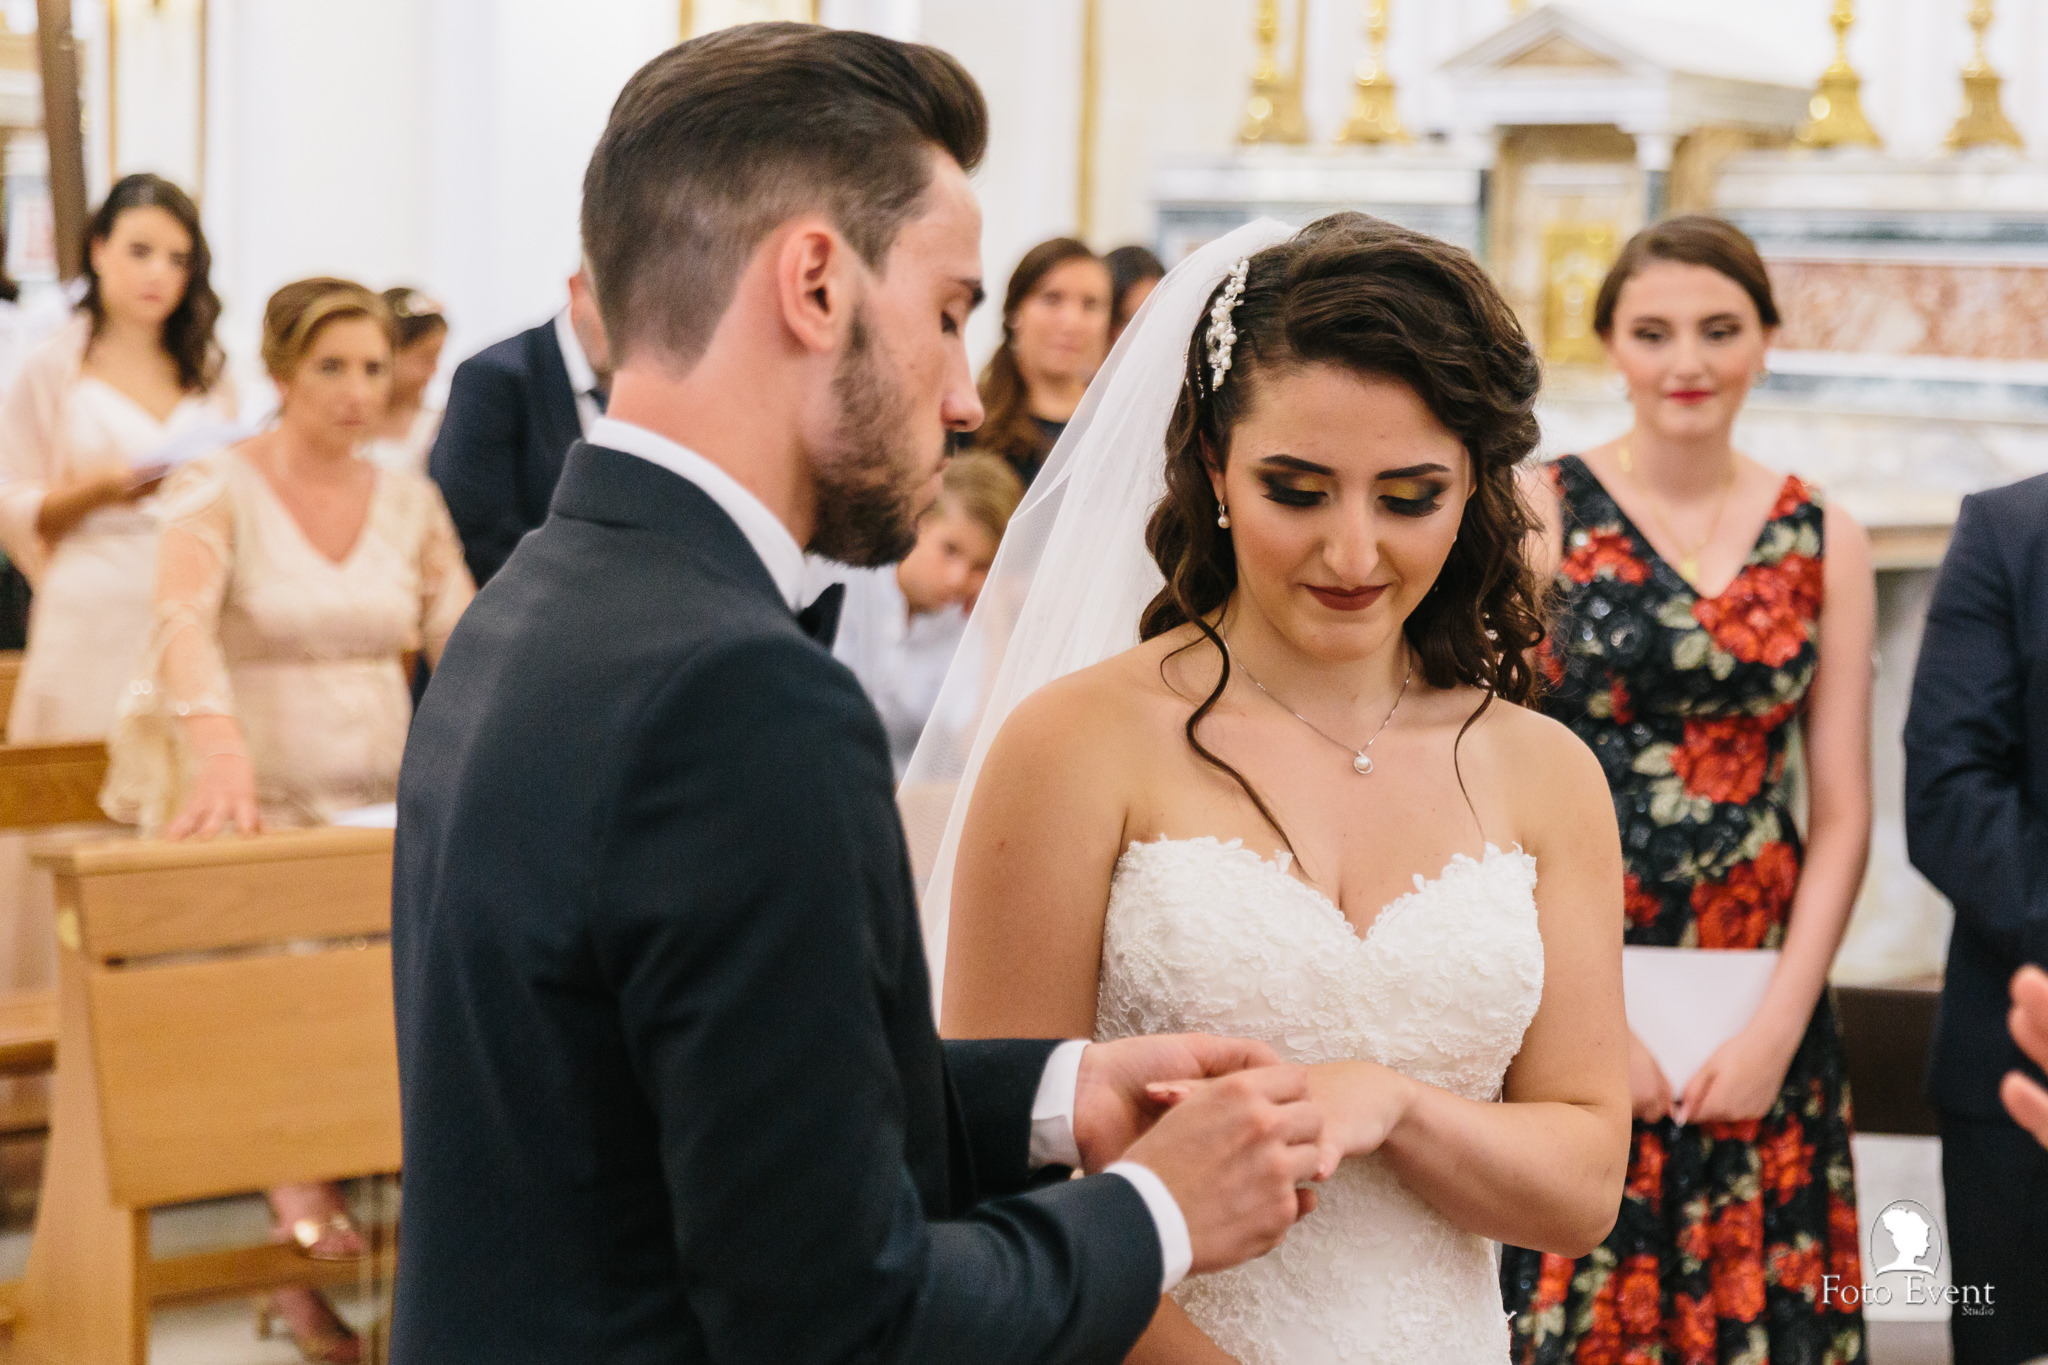 035-2019-08-31-Matrimonio-Serena-e-Saverio-Tarantino-5DE-1138